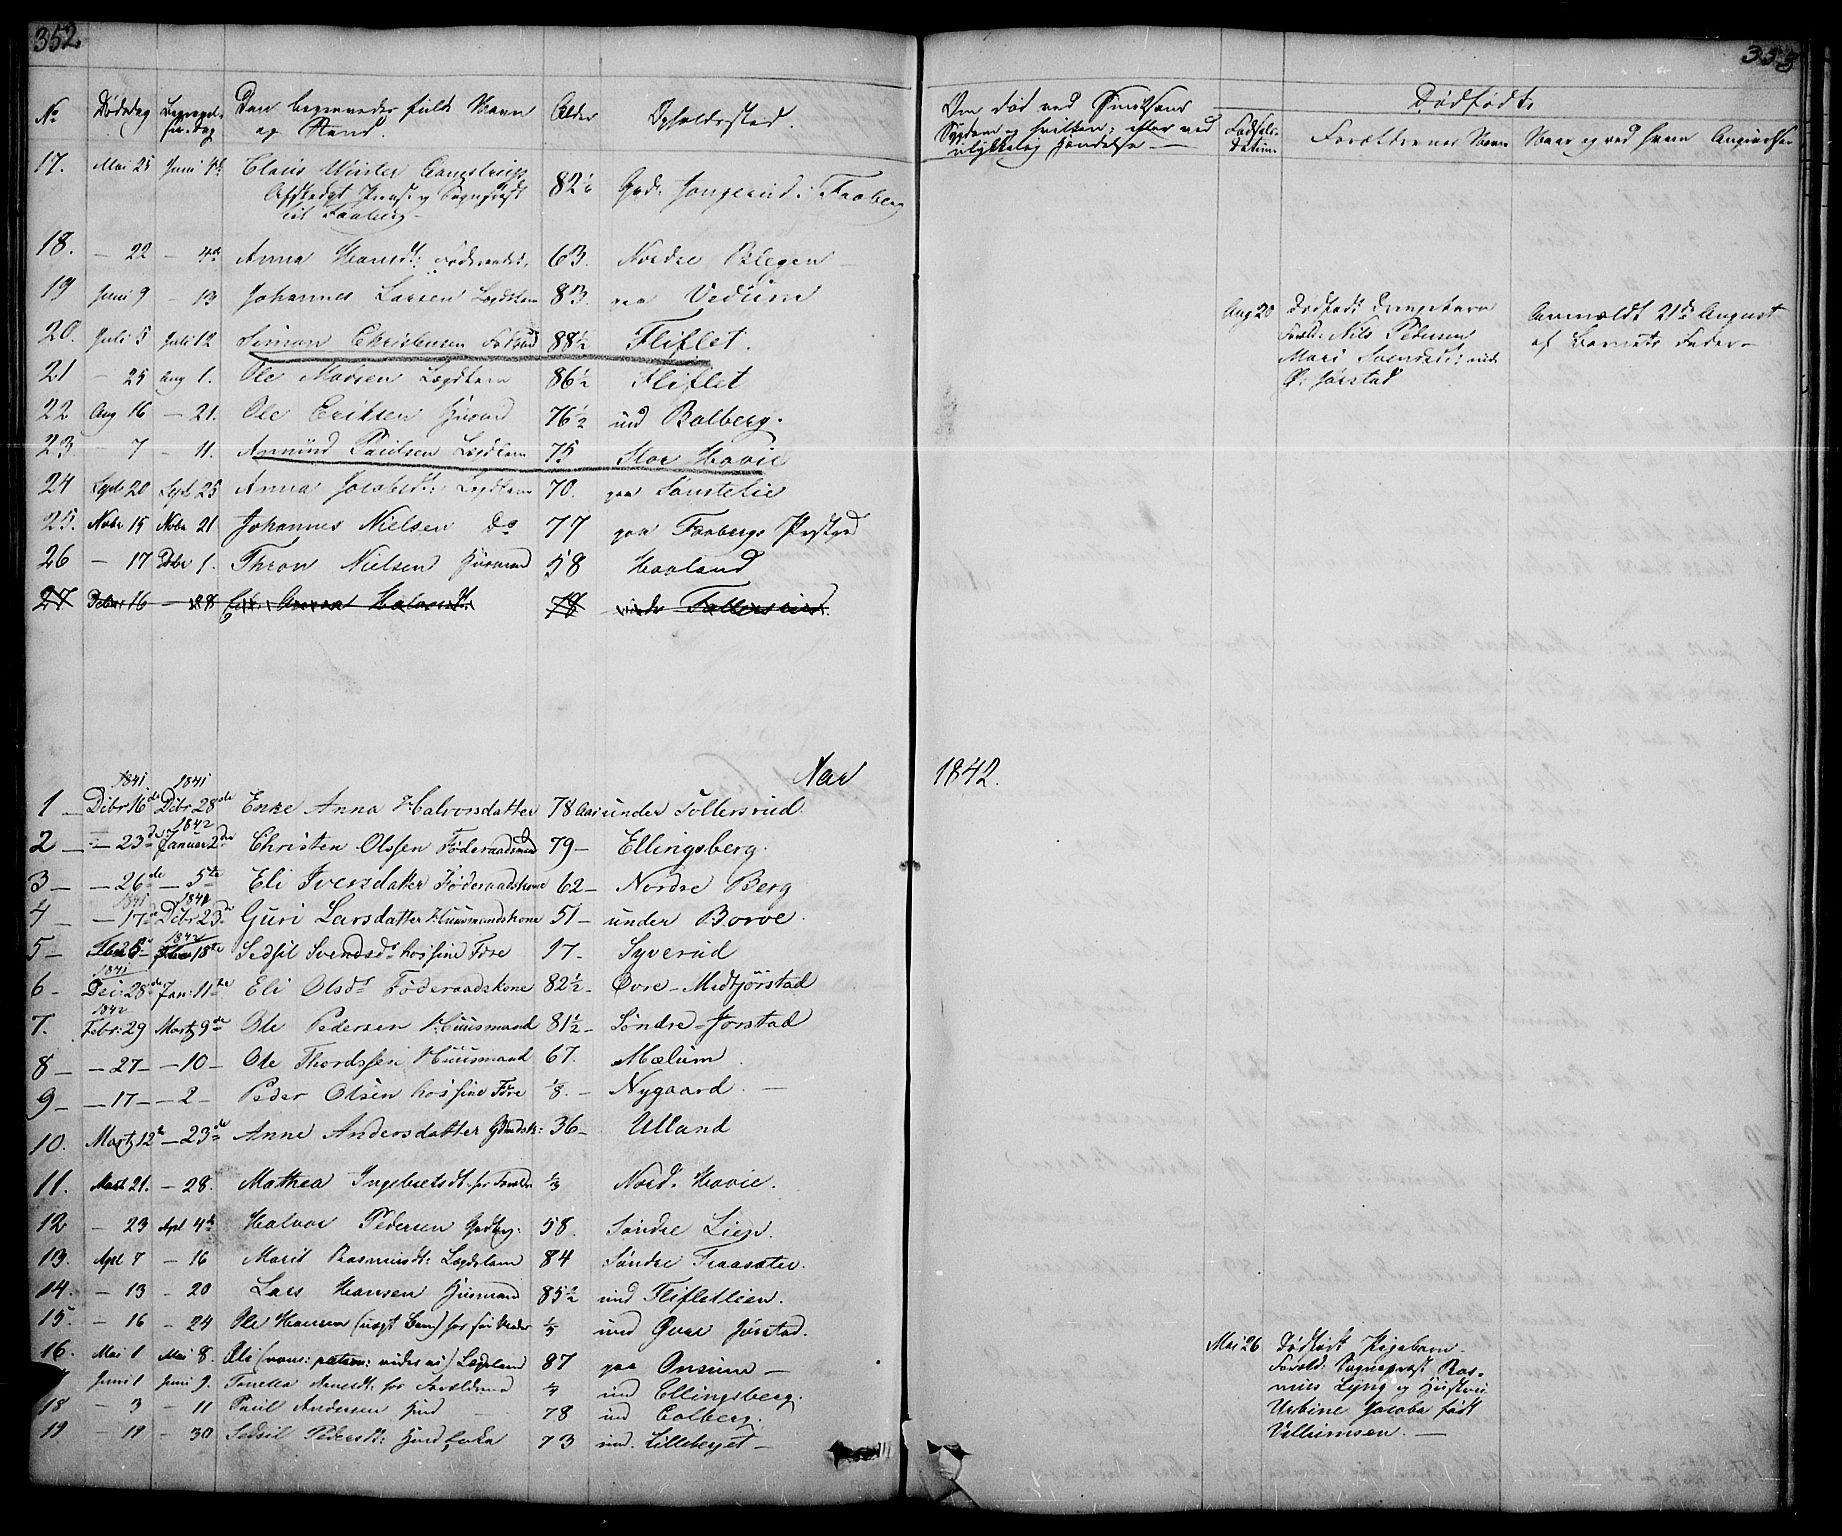 SAH, Fåberg prestekontor, Klokkerbok nr. 5, 1837-1864, s. 352-353